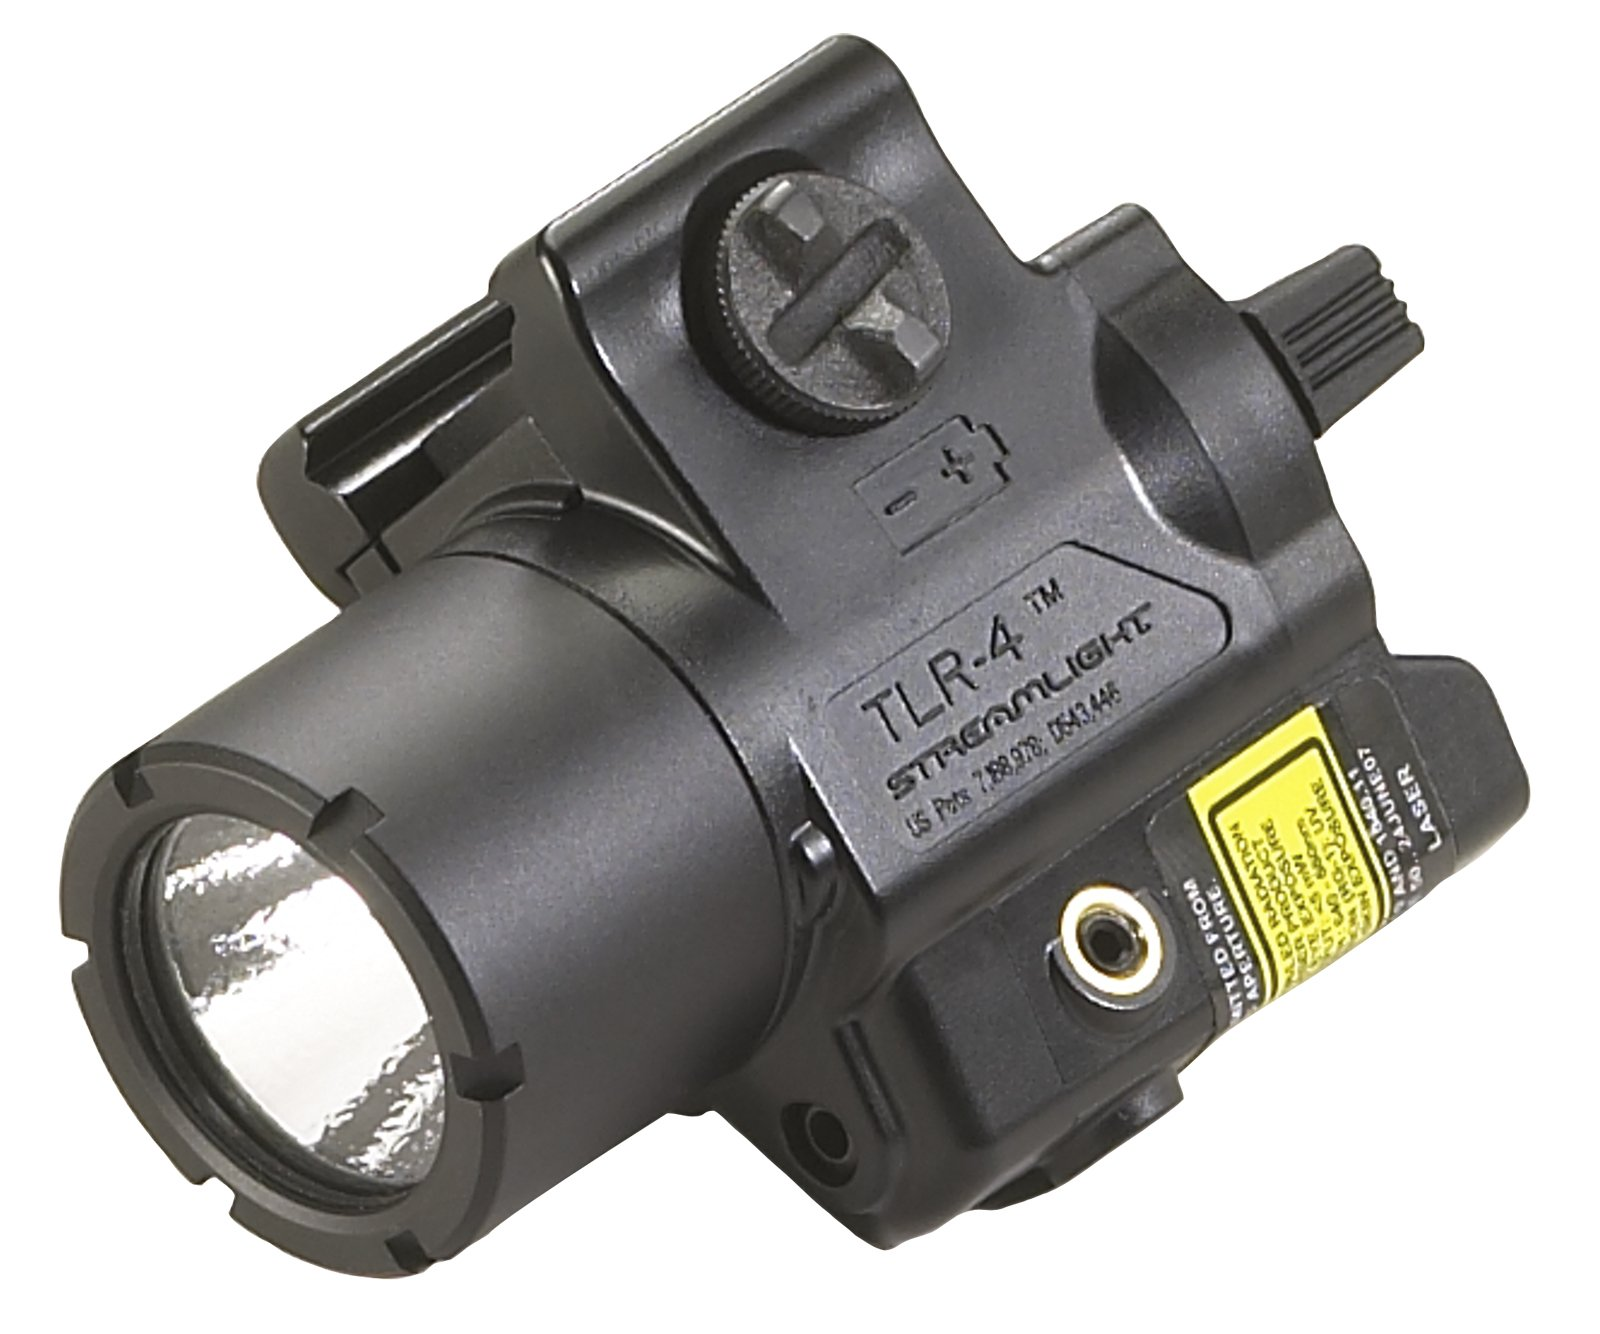 Streamlight TLR-4 Tac Light with Laser, Black by Streamlight